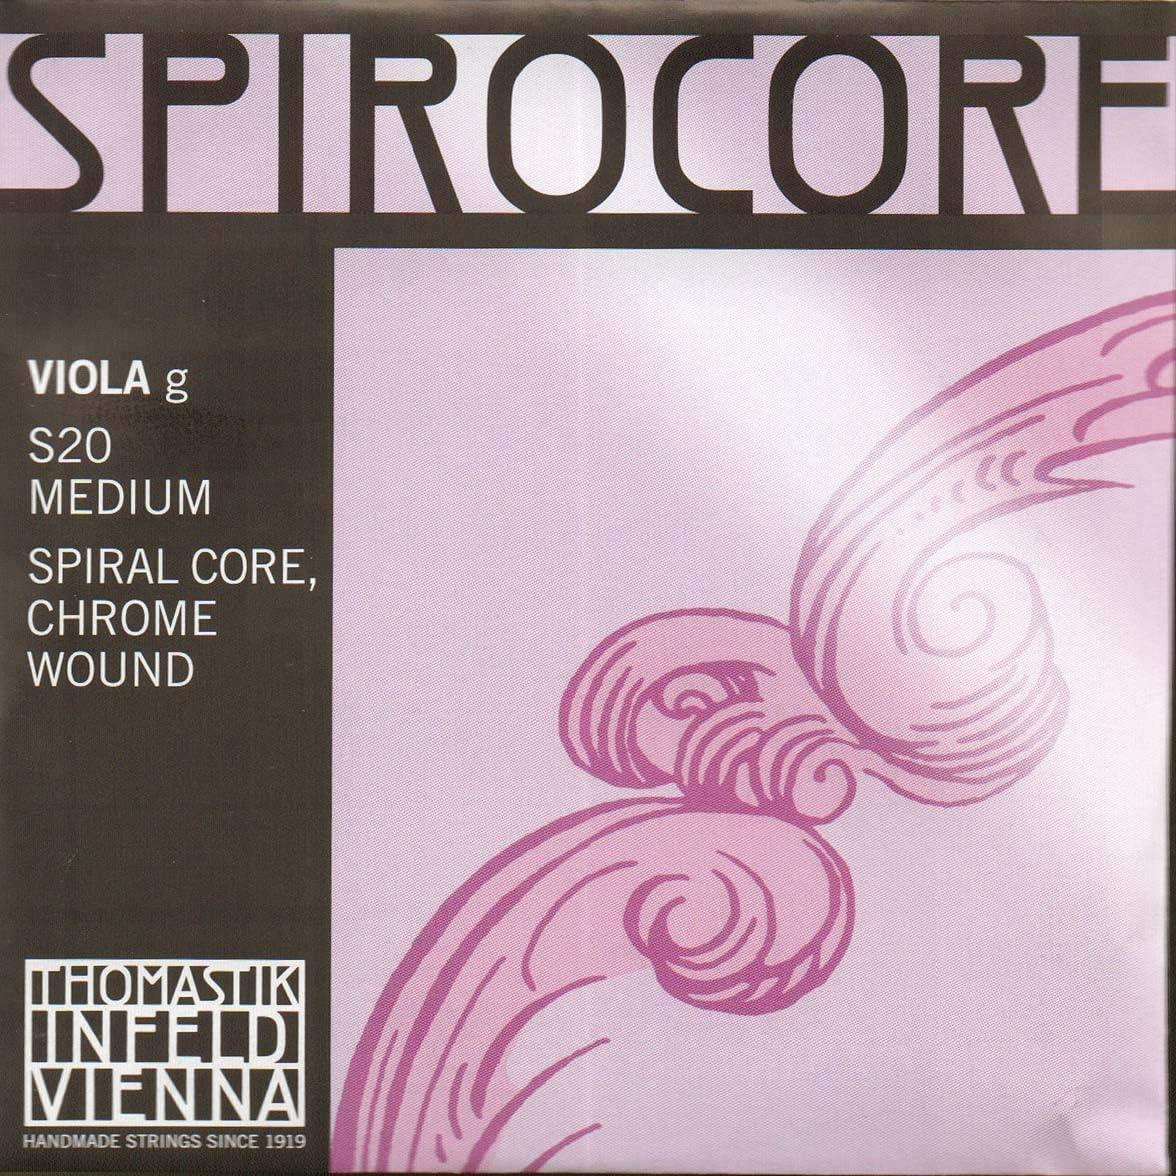 G-string spiral core chrome steel wound medium Thomastik Single string for Viola 4//4 Spirocore